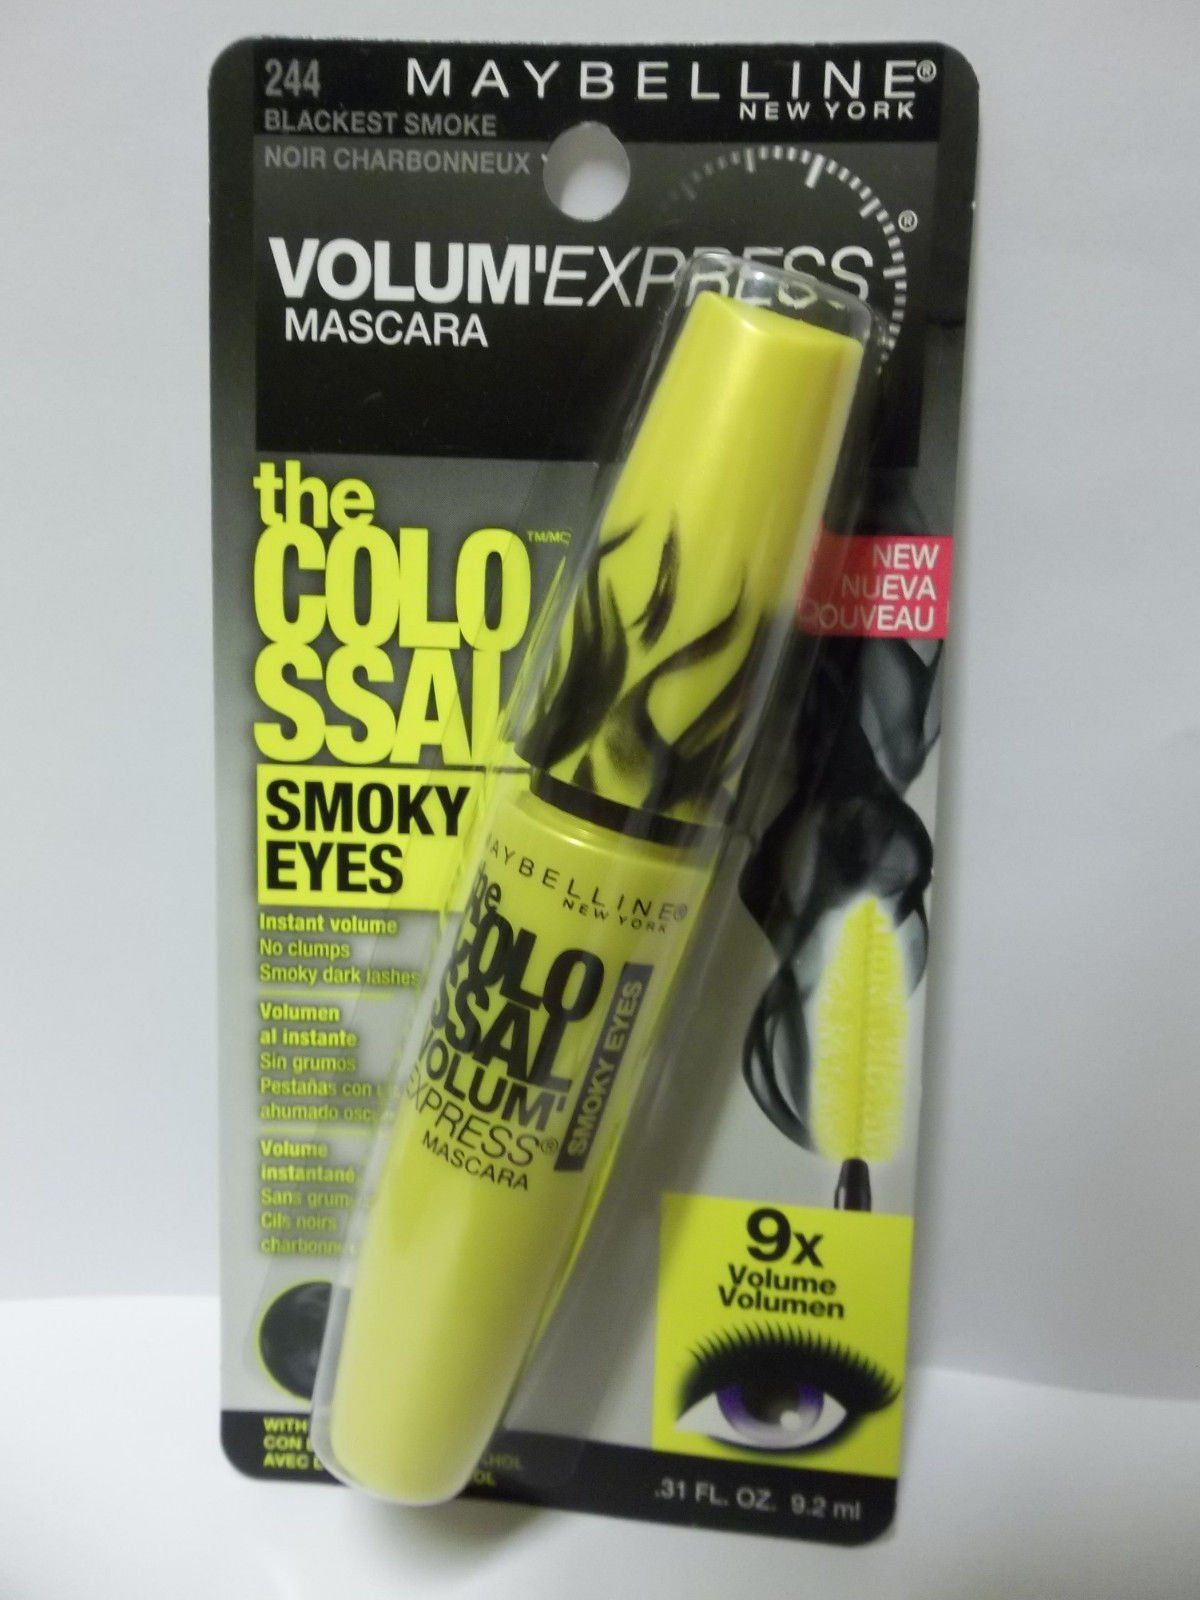 aa8e1cd8f53 Maybelline Volum `Express The Colossal Smoky Eyes Mascara, 244 ...